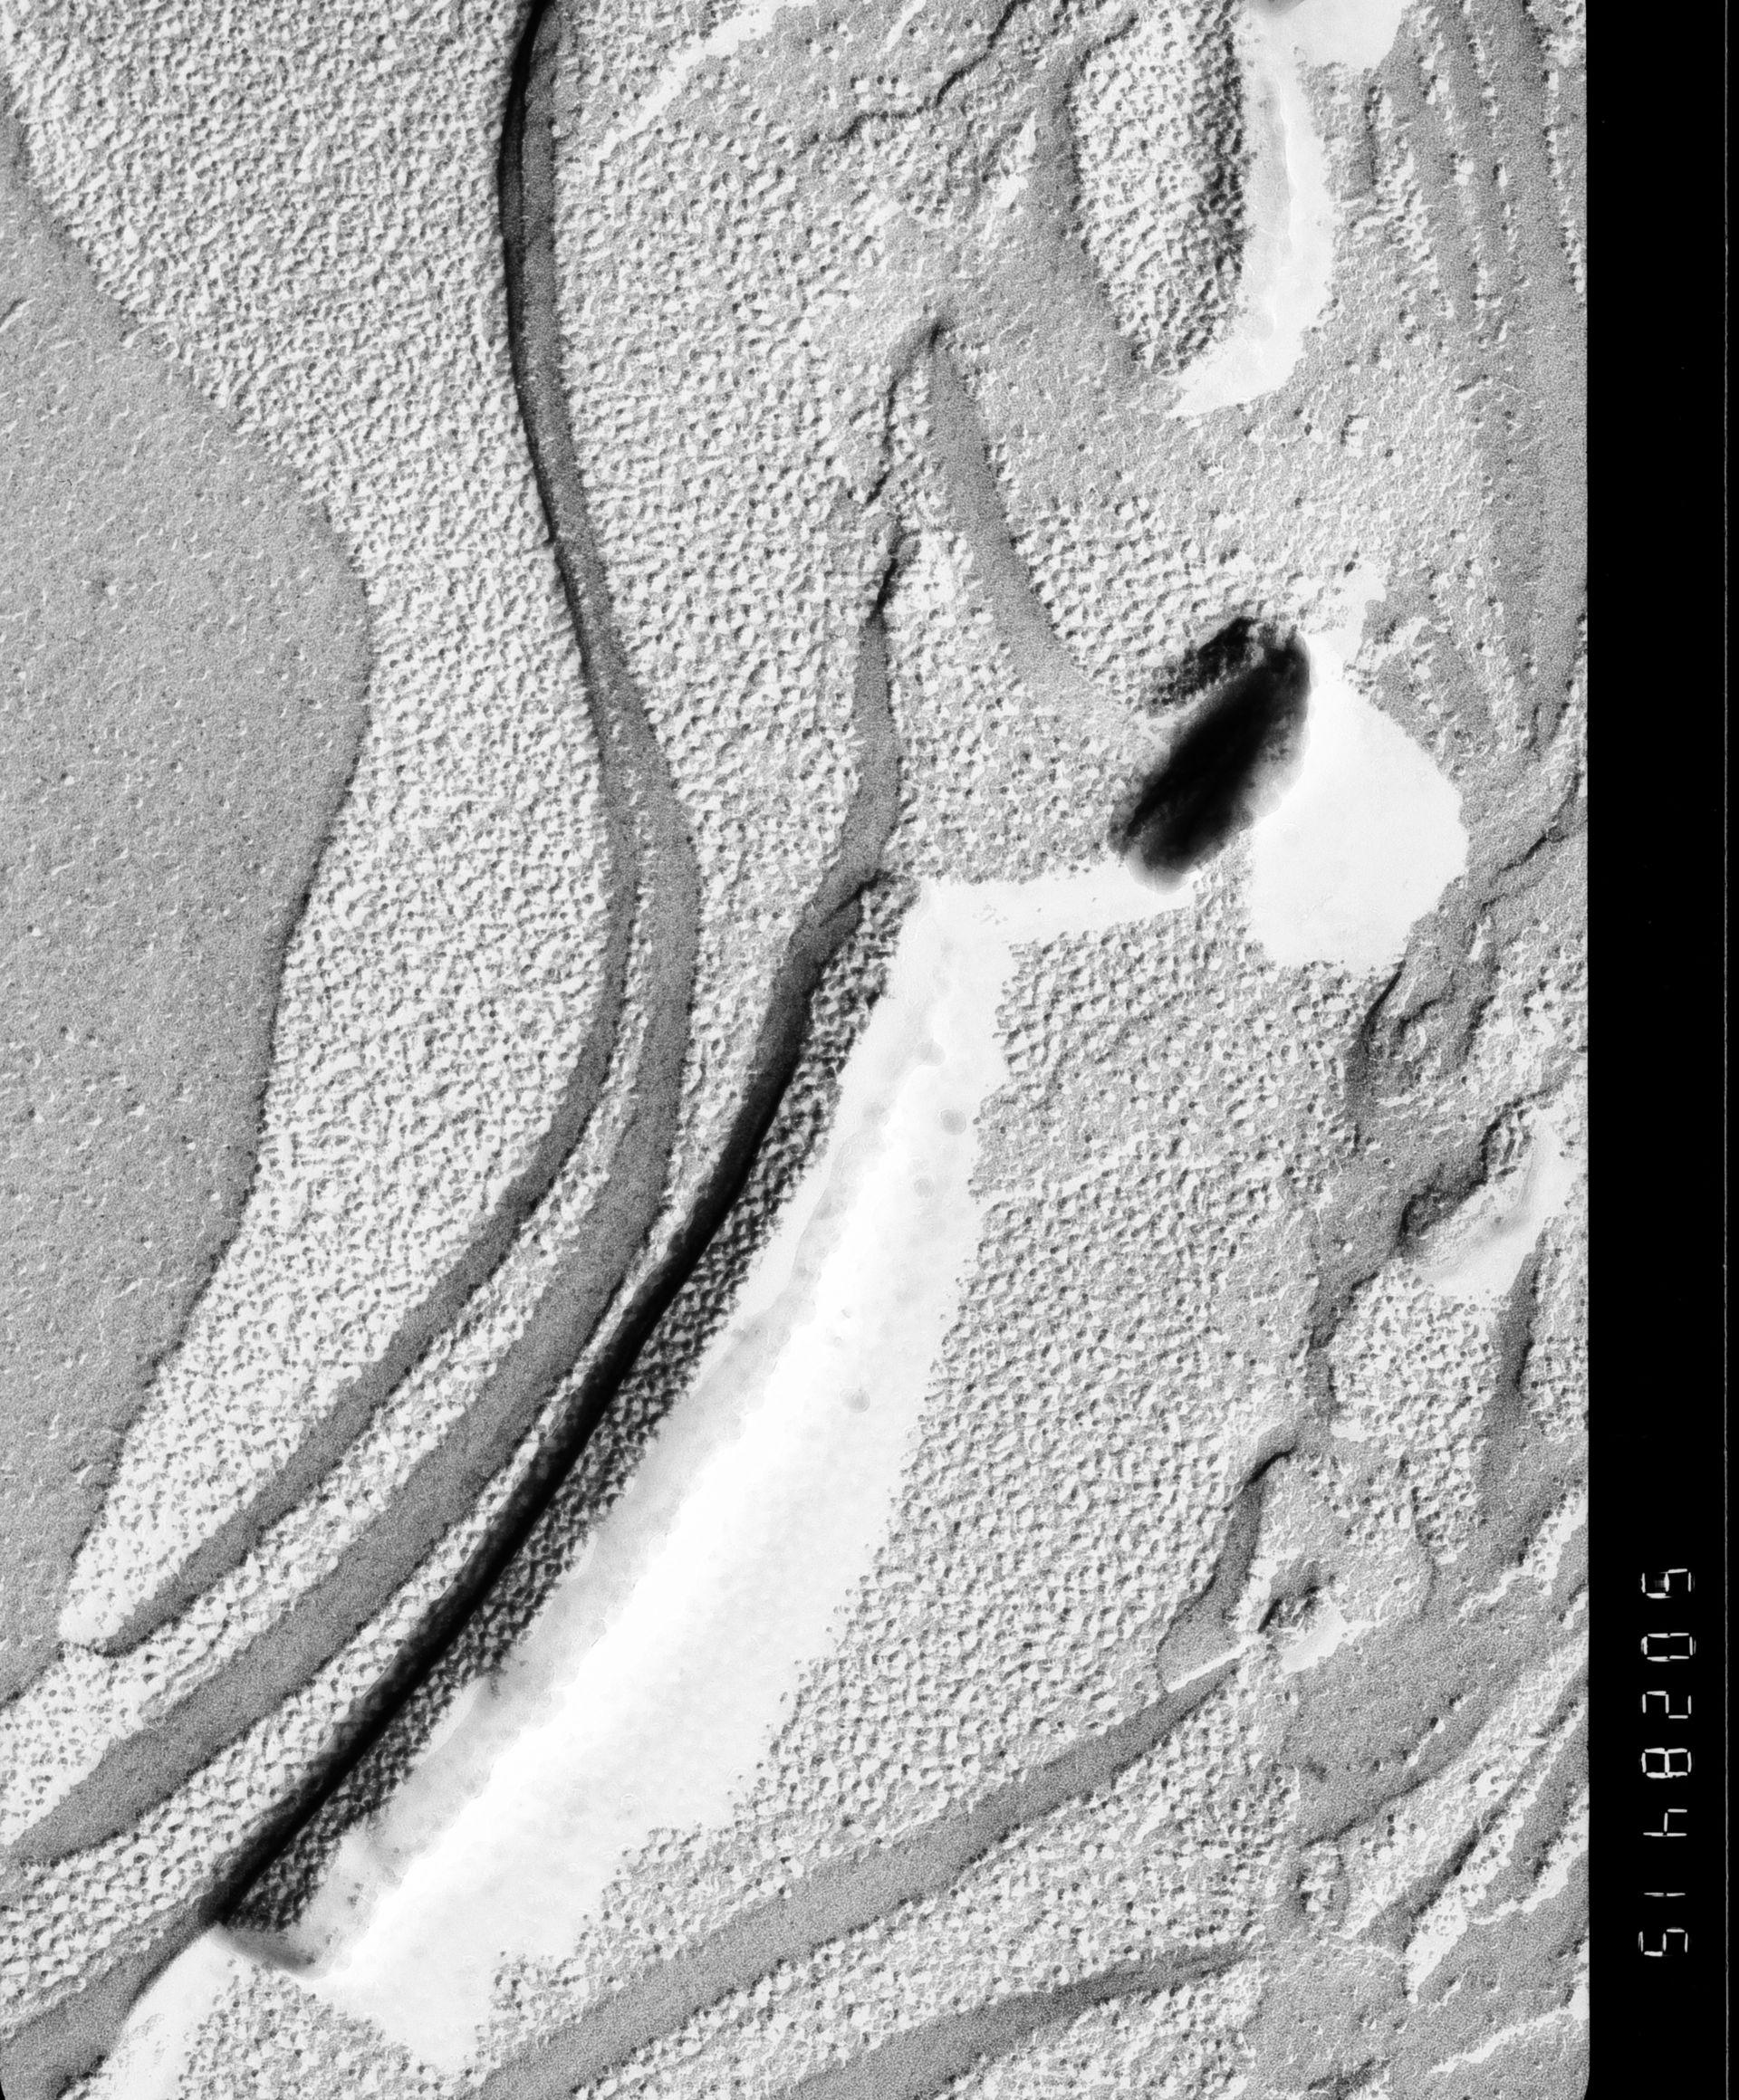 Prochloron (Thylakoid) - CIL:16227